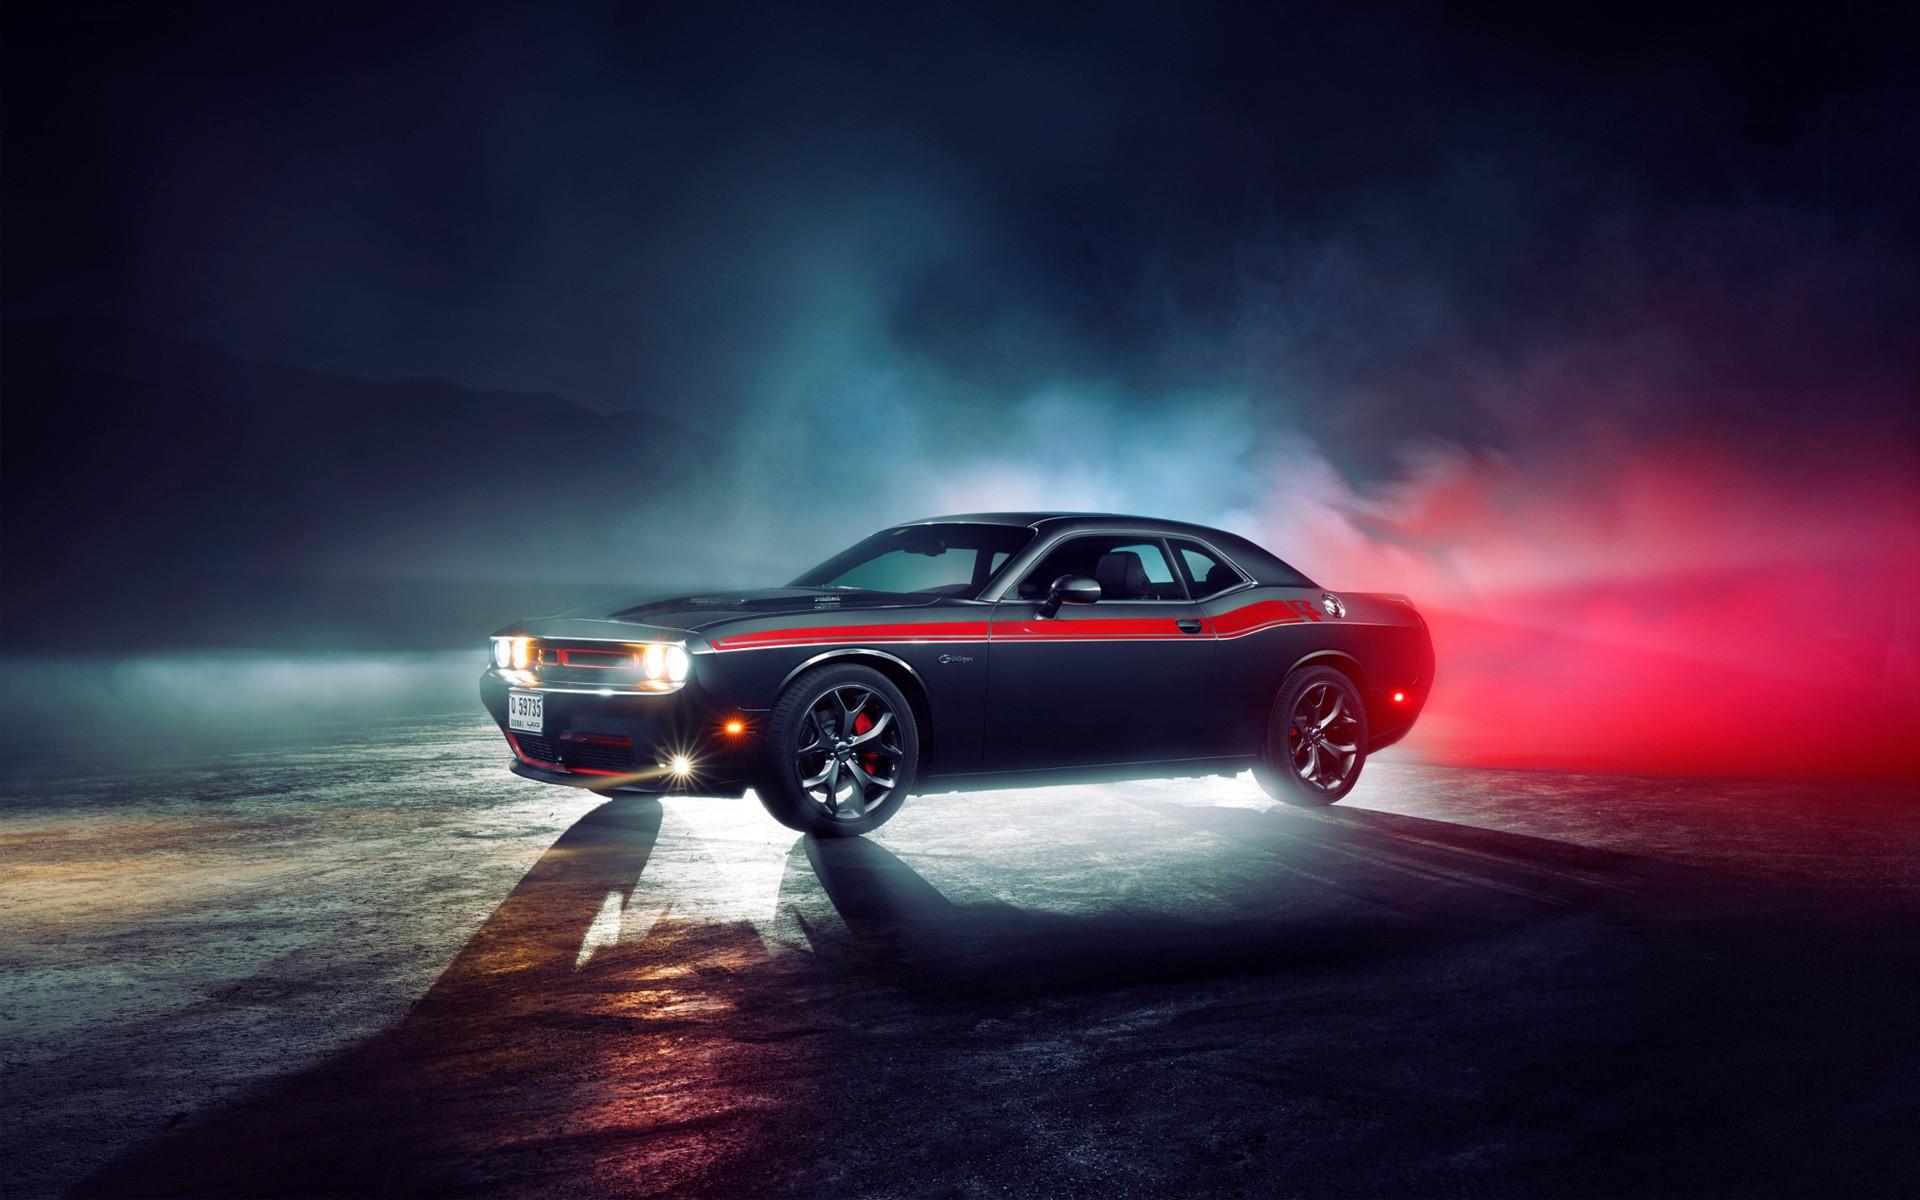 Dodge Challenger RT Wallpaper | HD Car Wallpapers | ID #5855